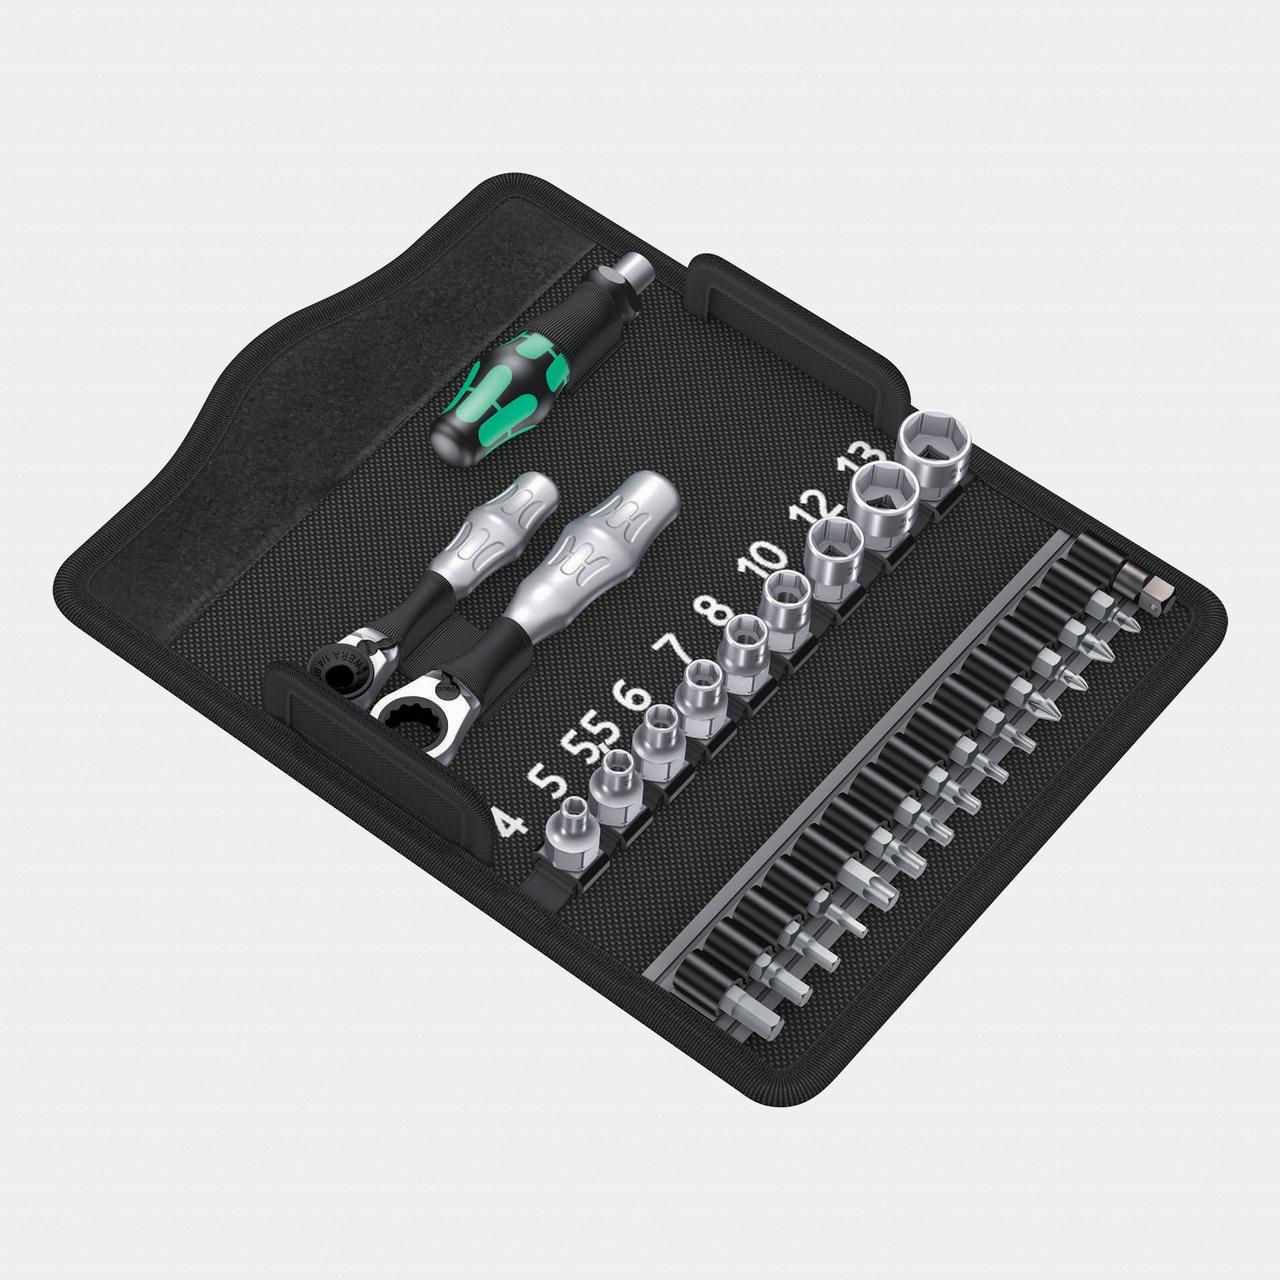 Wera 135918 Kraftform Kompakt Zyklop Mini 2 Set - KC Tool